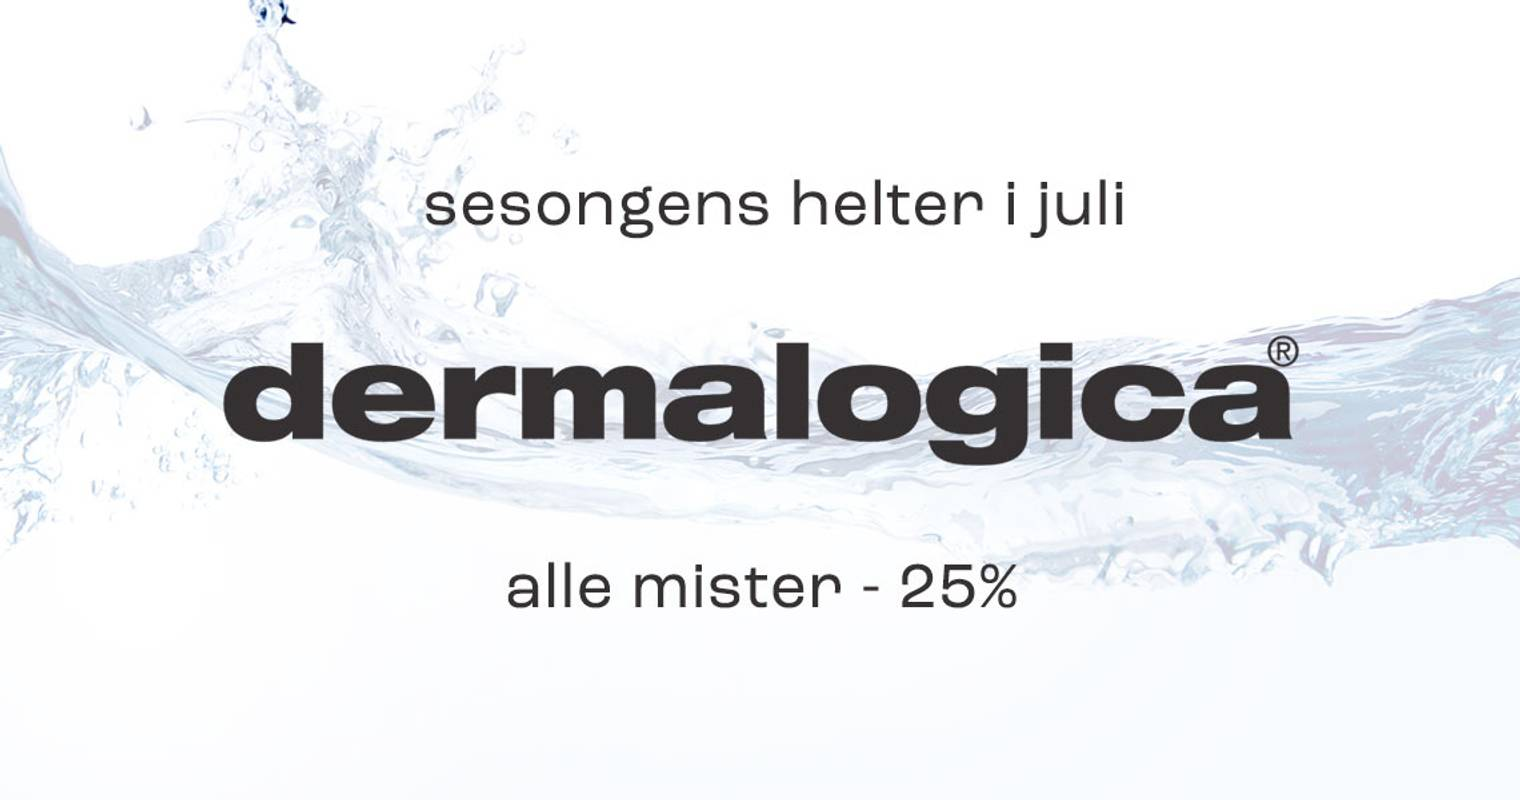 https://www.essensbeauty.no/manufacturers/dermalogica